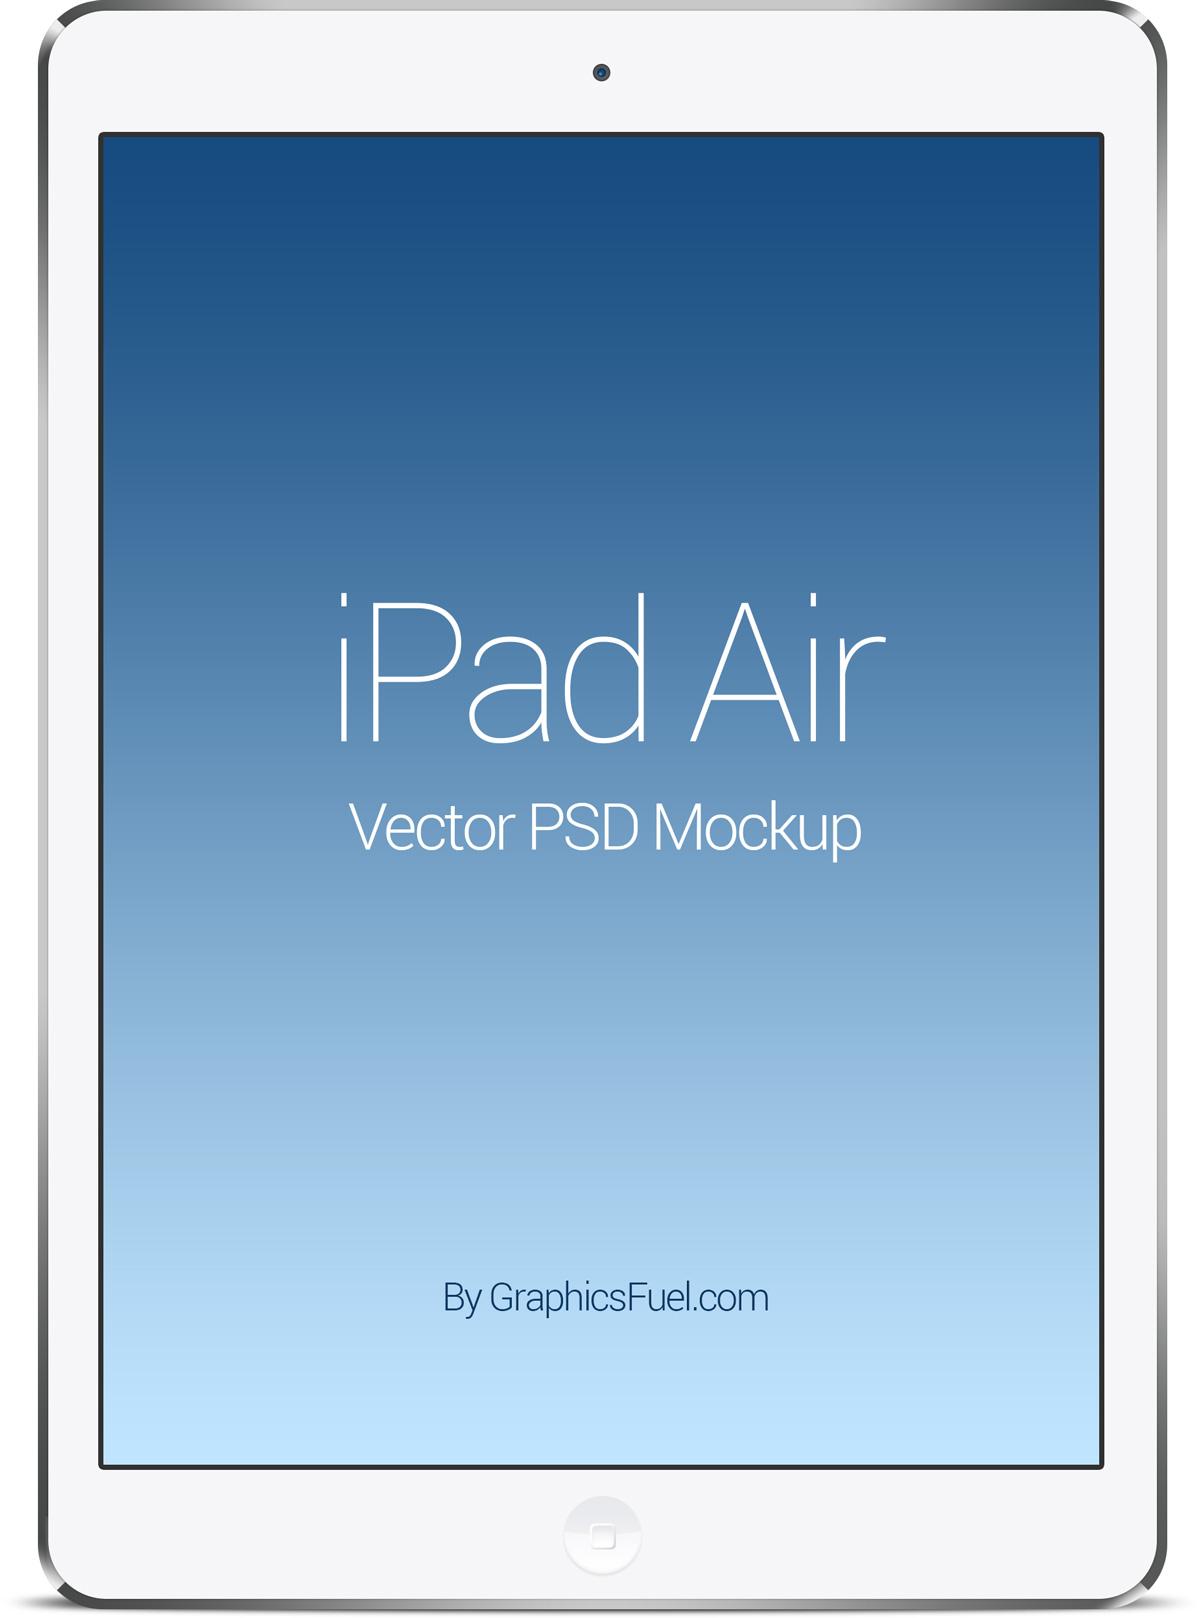 Ipad Air Psd Mockup Graphicsfuel